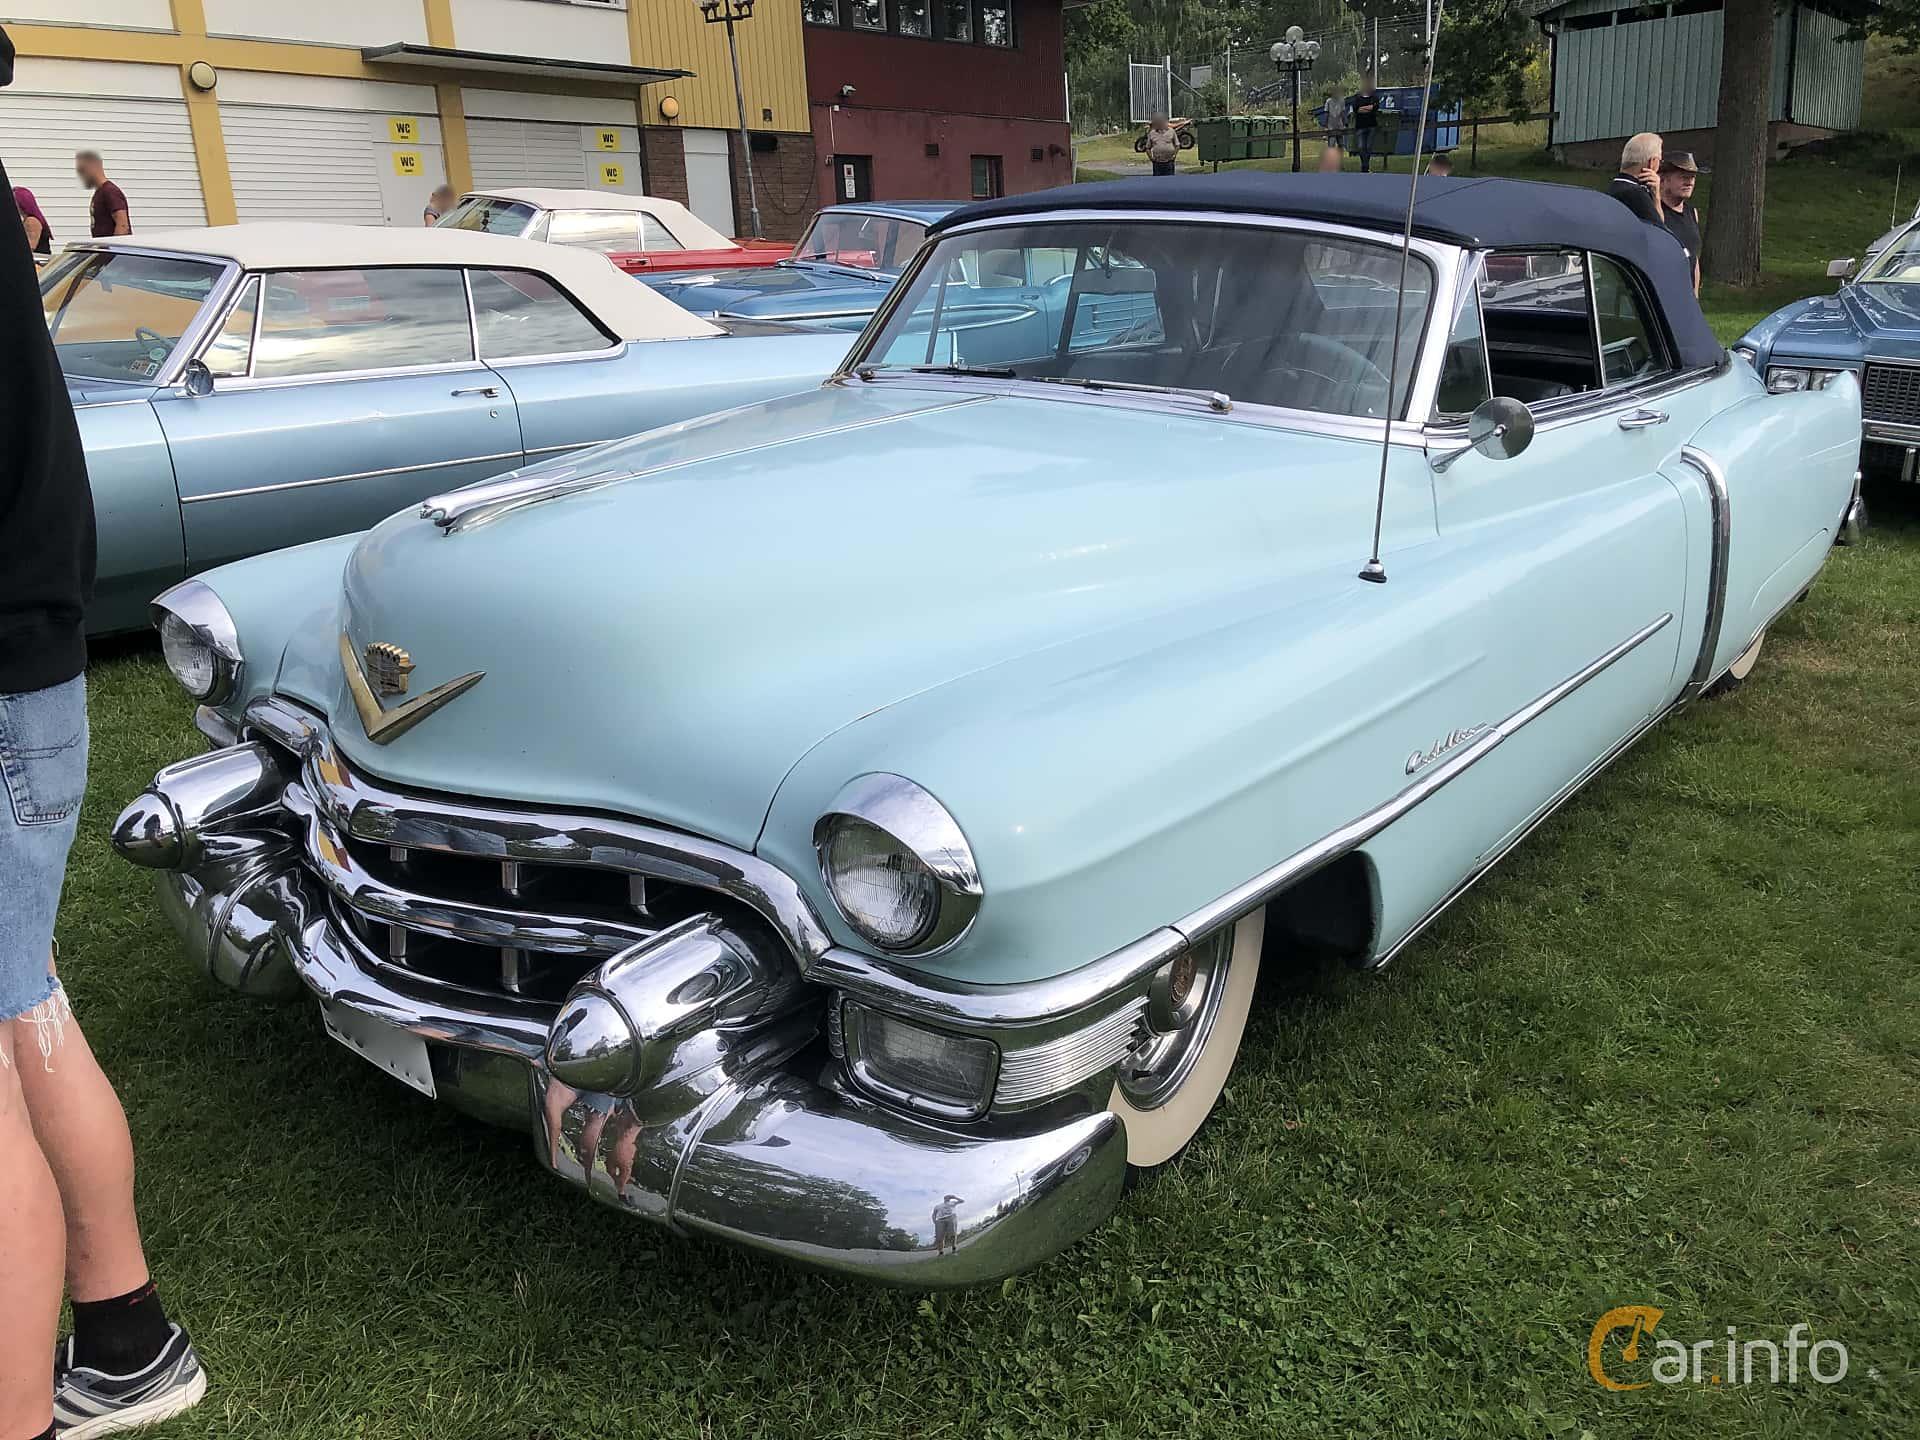 Front/Side  of Cadillac Sixty-Two Convertible 5.4 V8 Hydra-Matic, 213ps, 1953 at Bil & MC-träffar i Huskvarna Folkets Park 2019 vecka 32 tema Hot Rods